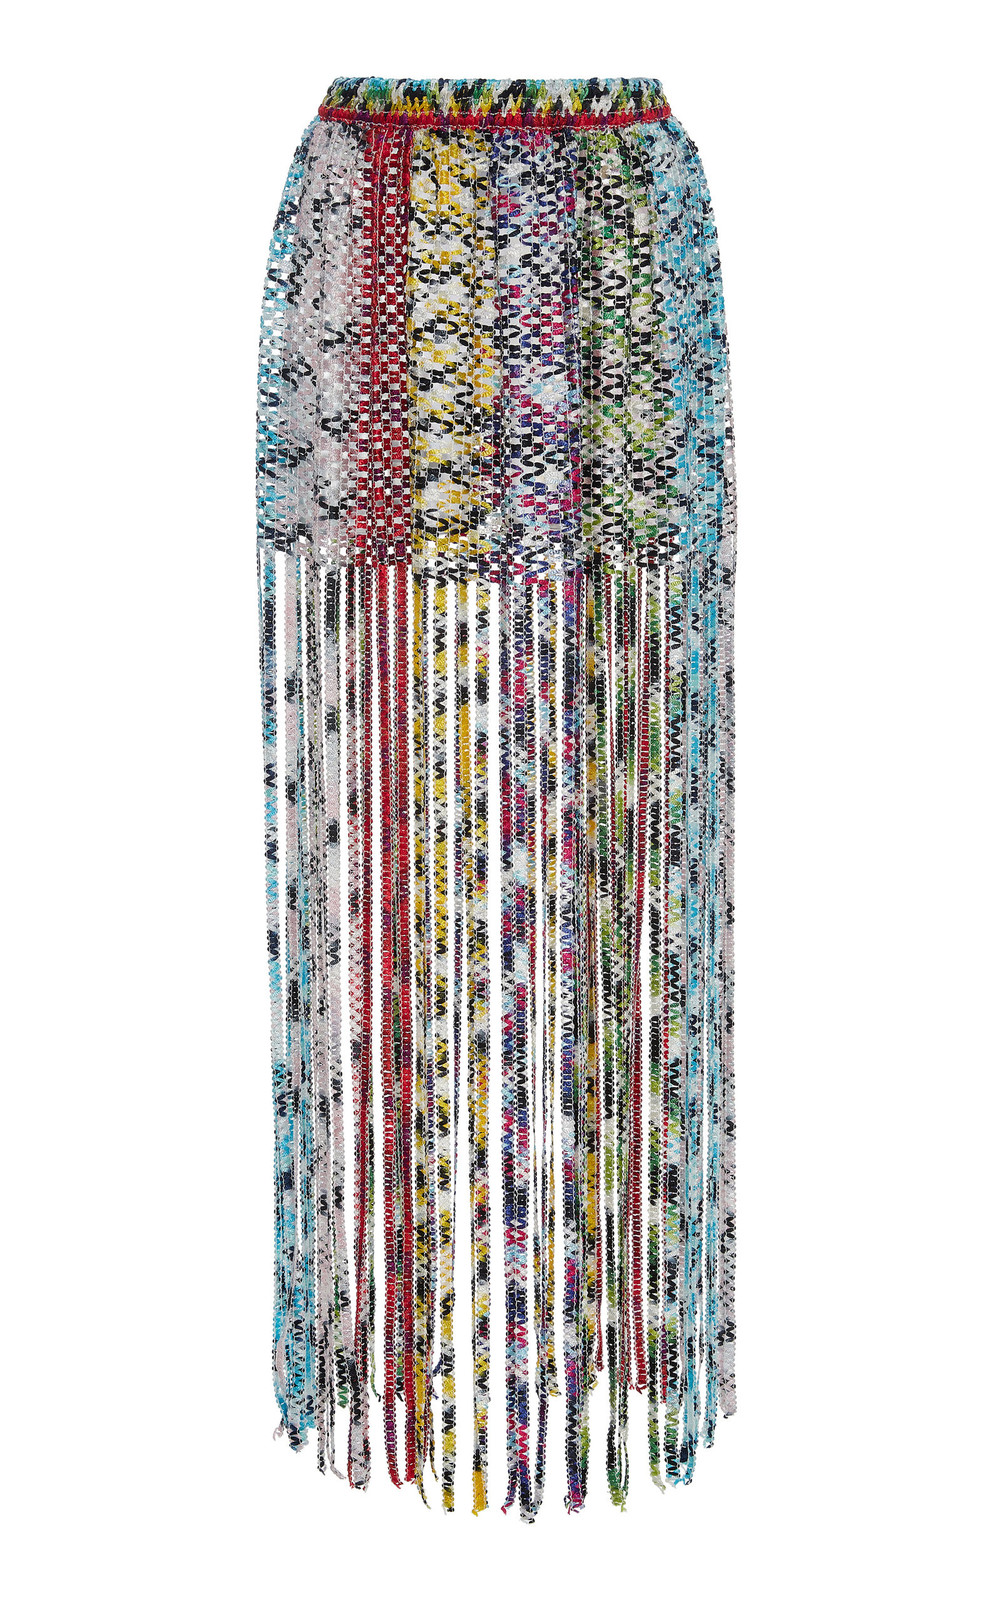 Missoni Mare Fringed Woven Mini Skirt in multi